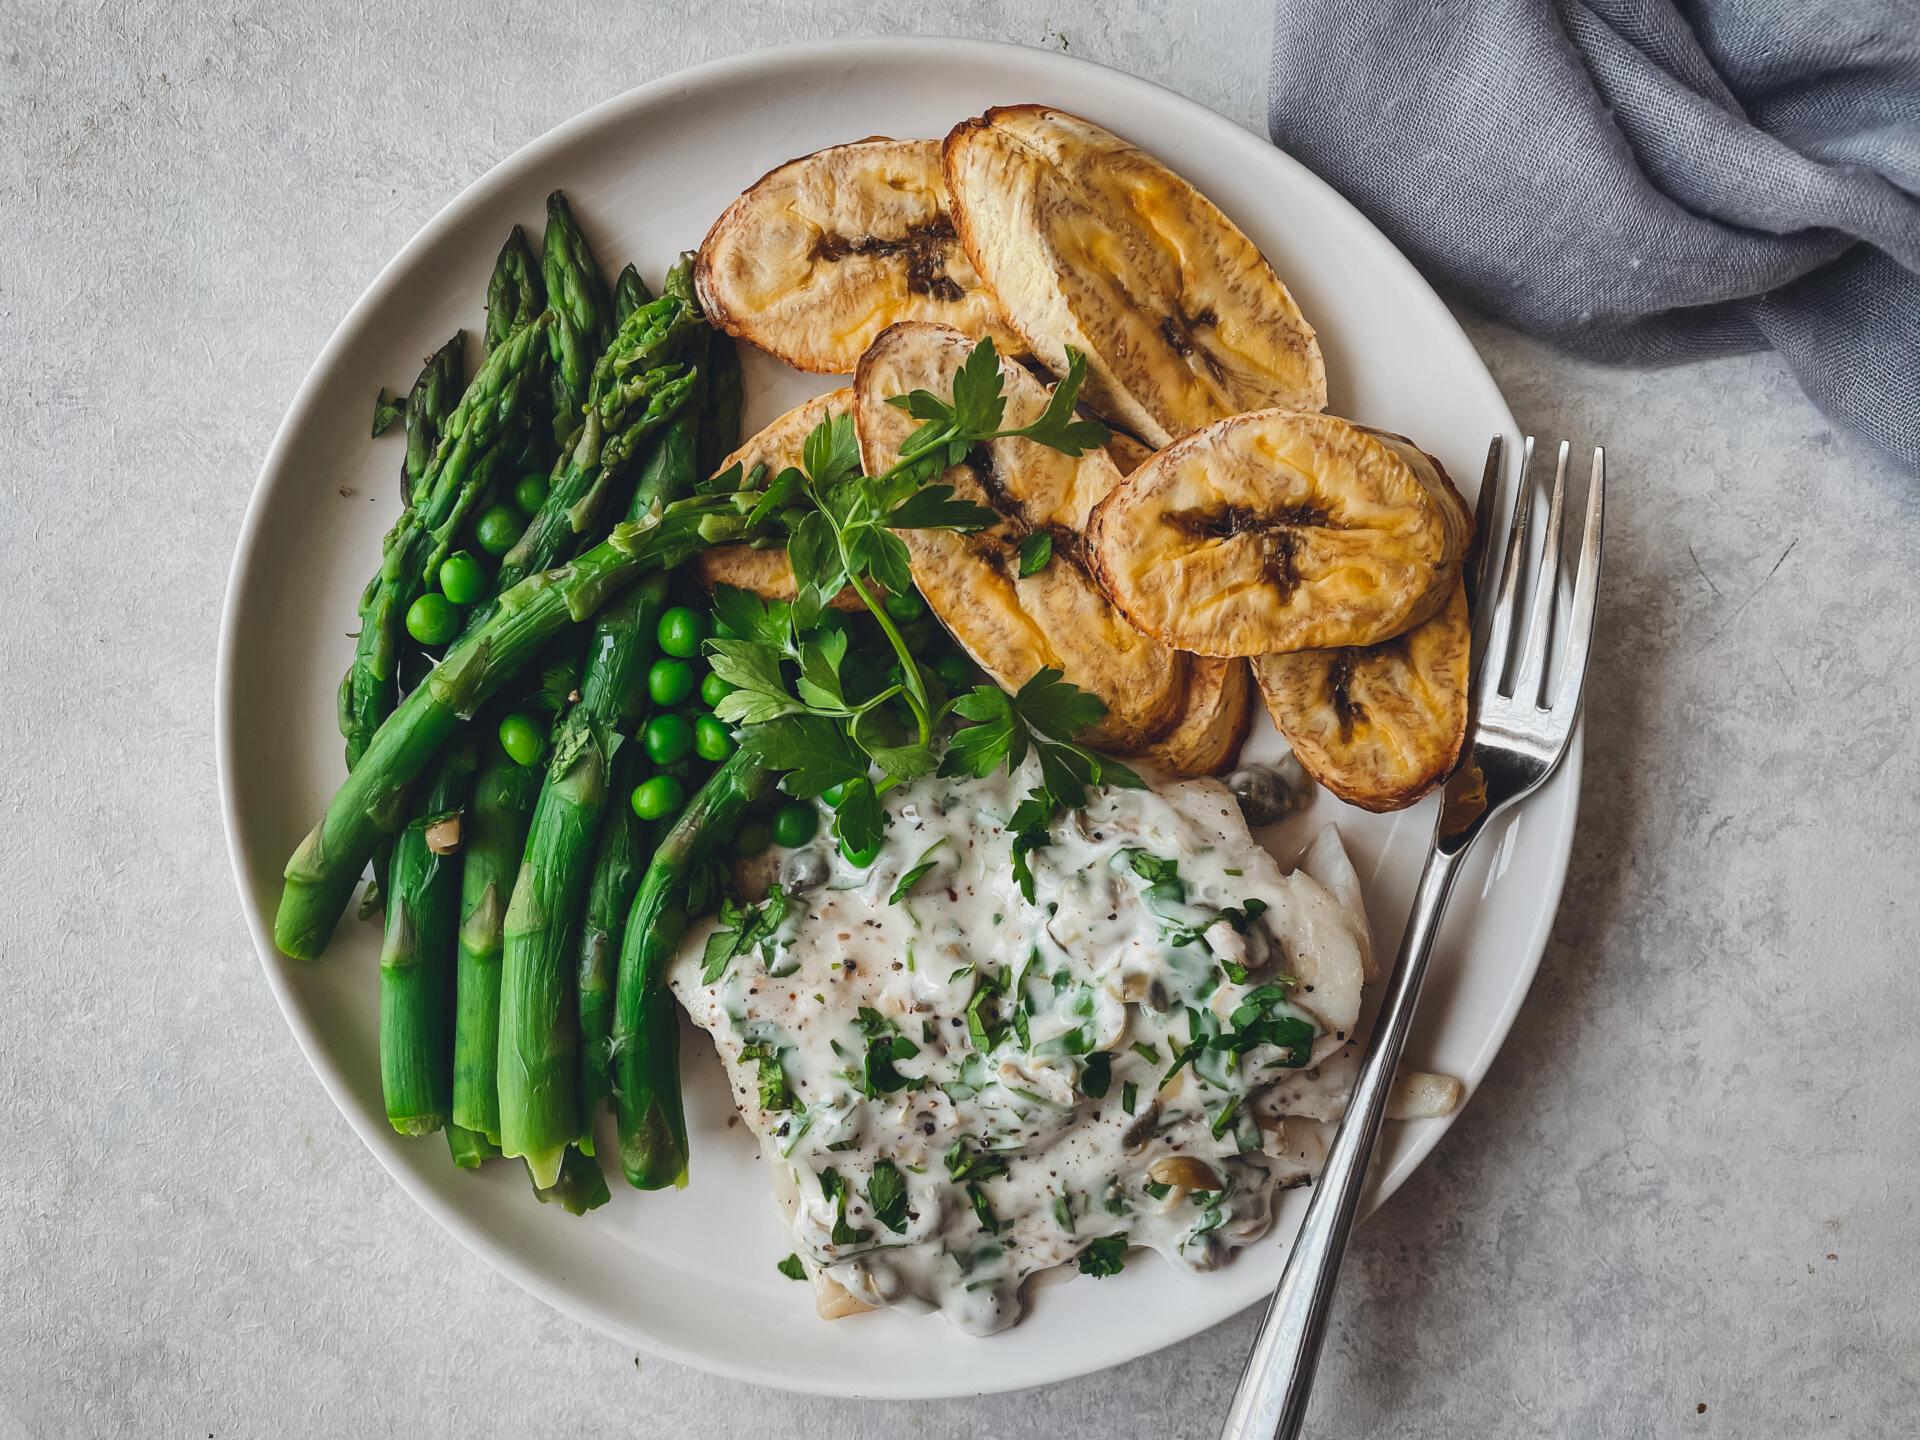 Baked Plaintain with Baked Fish & Asparagus